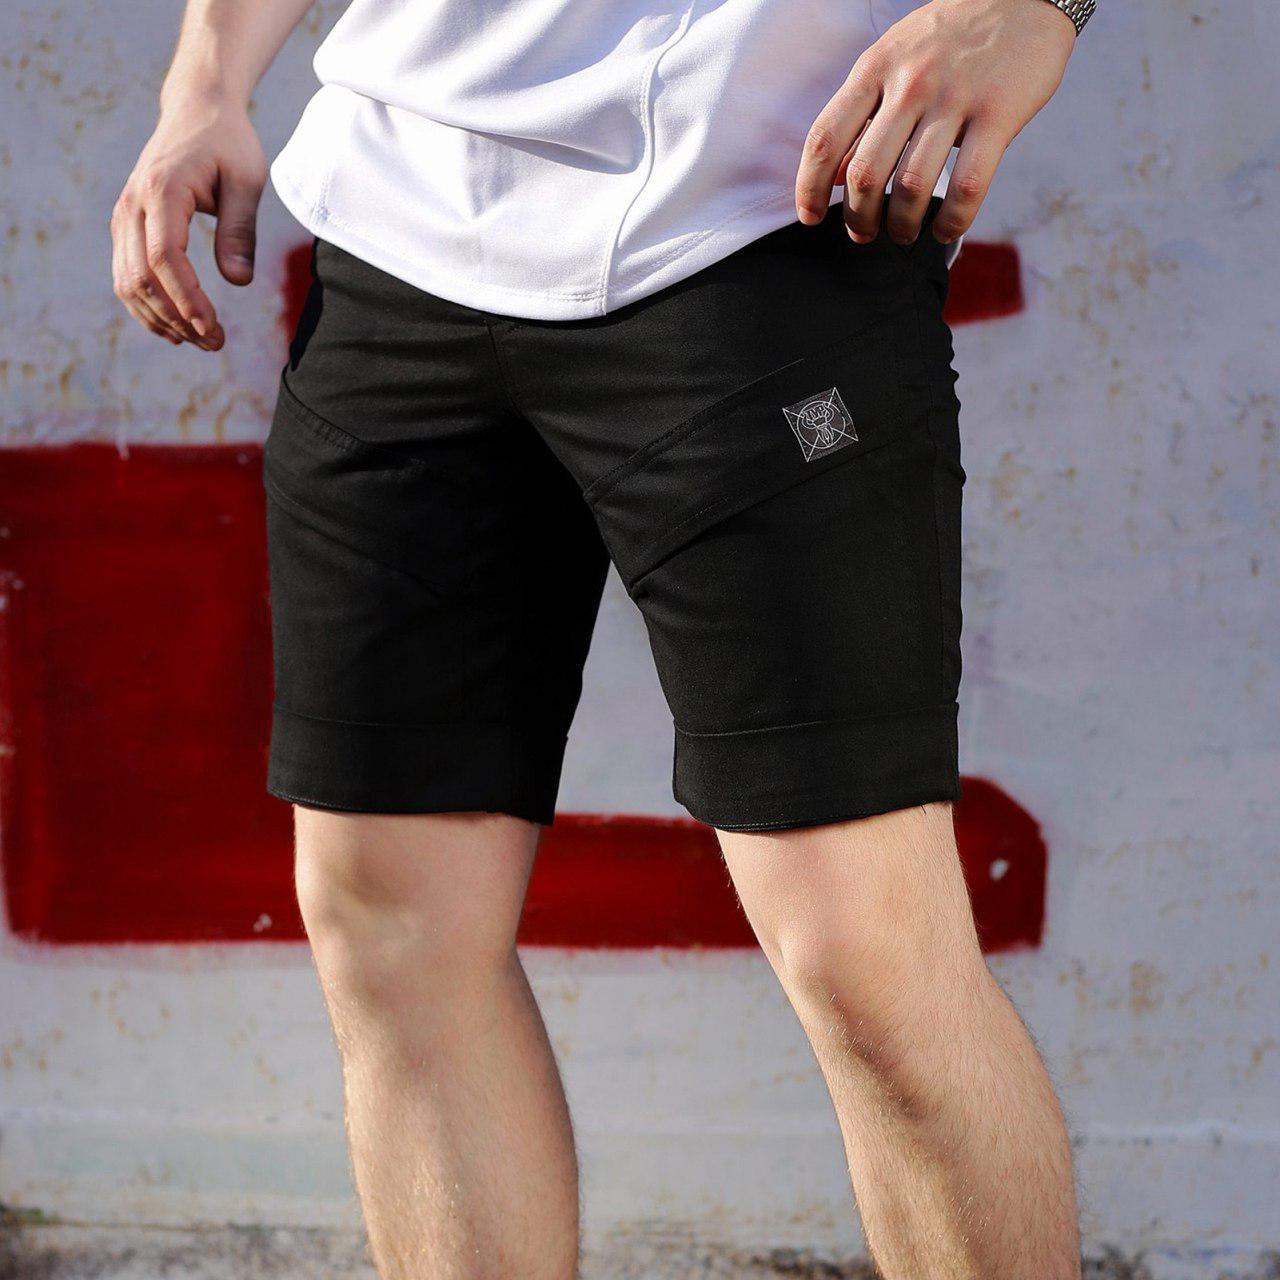 Шорты мужские черные бренд ТУР модель Чироки (Cherokee) TURWEAR